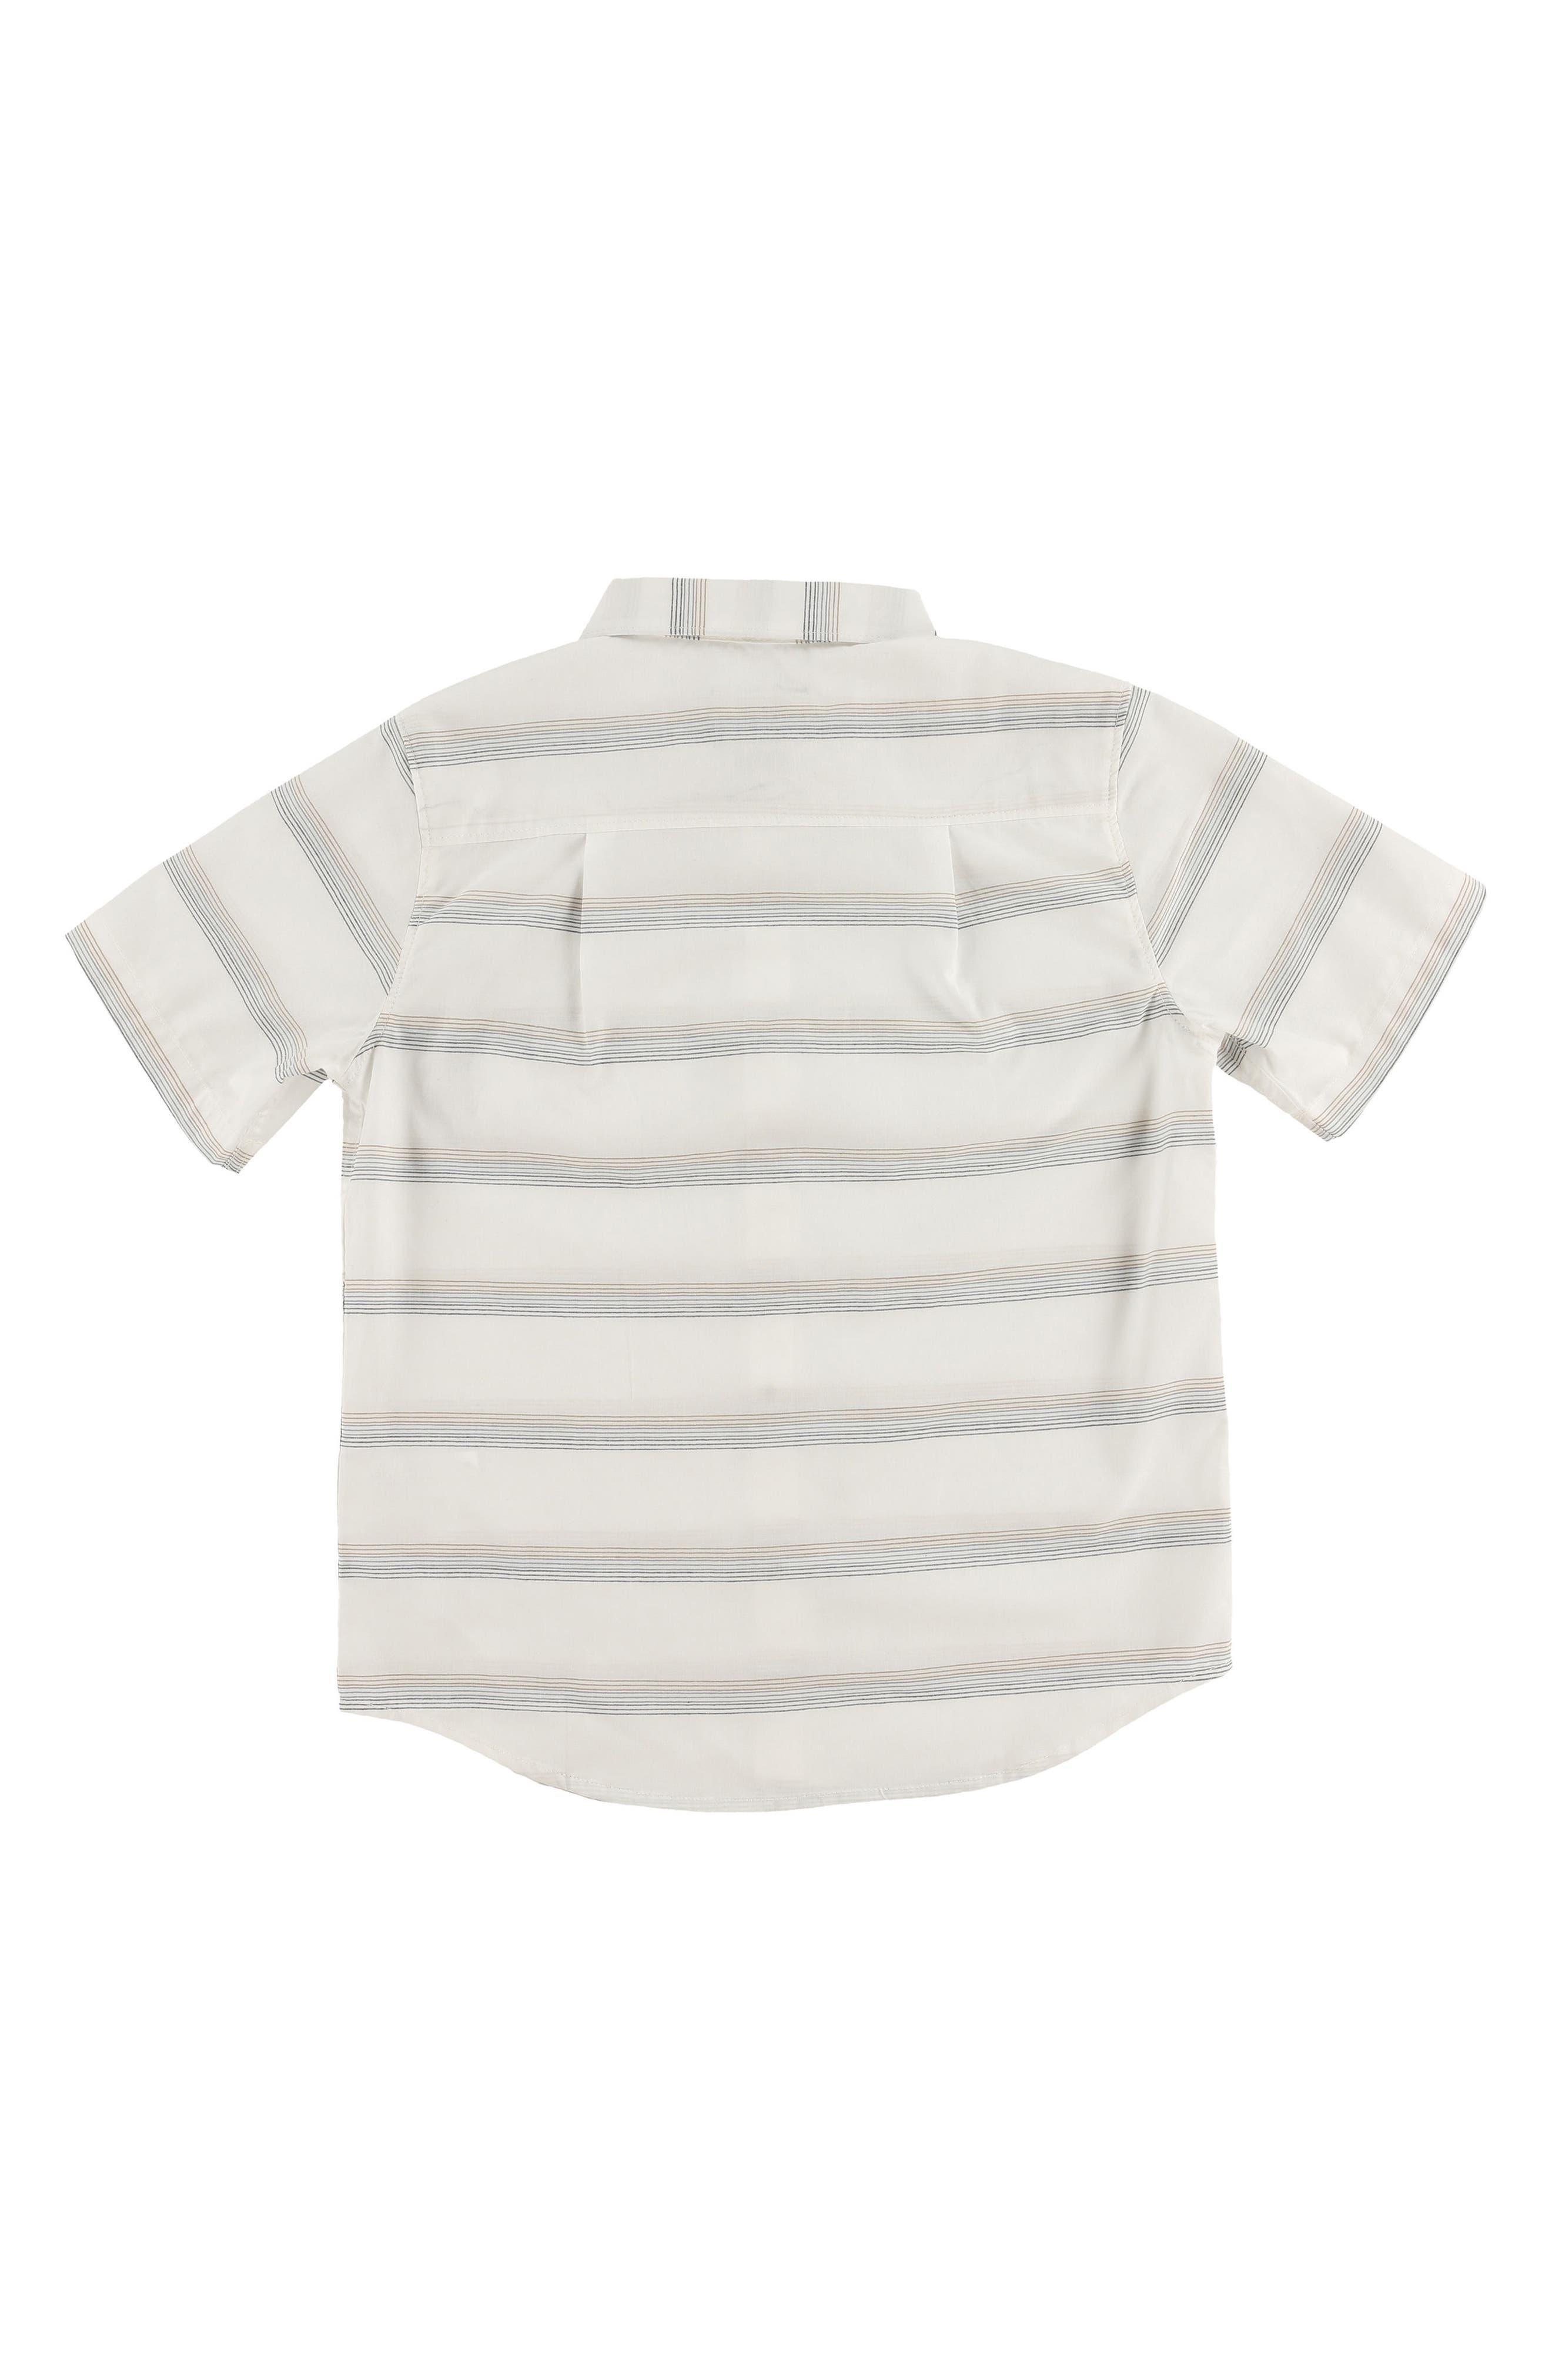 Pickett Woven Shirt,                             Alternate thumbnail 2, color,                             White